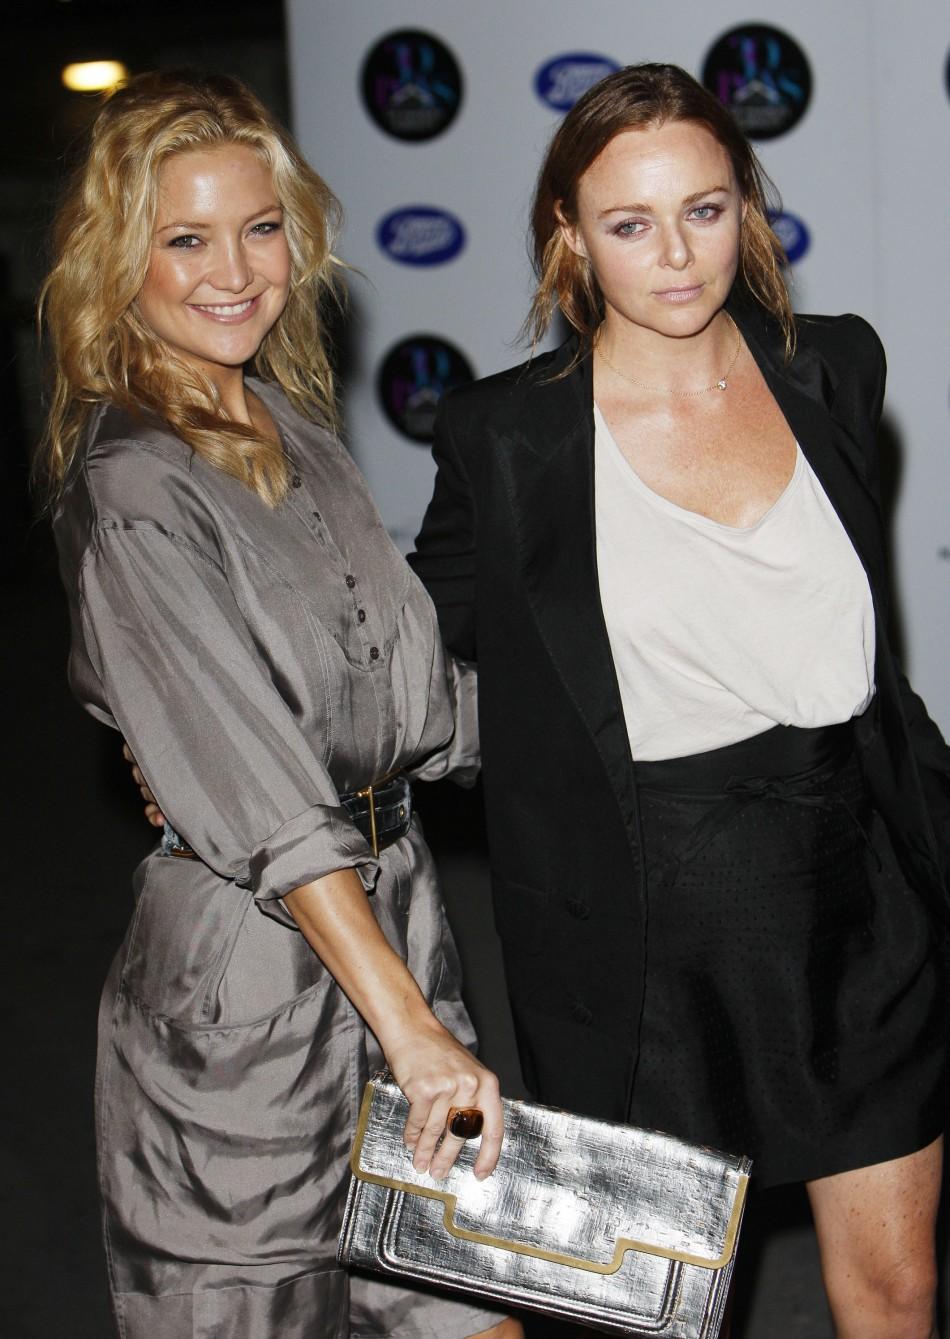 British Fashion Awards 2011: Red Carpet Award - Stella McCartney